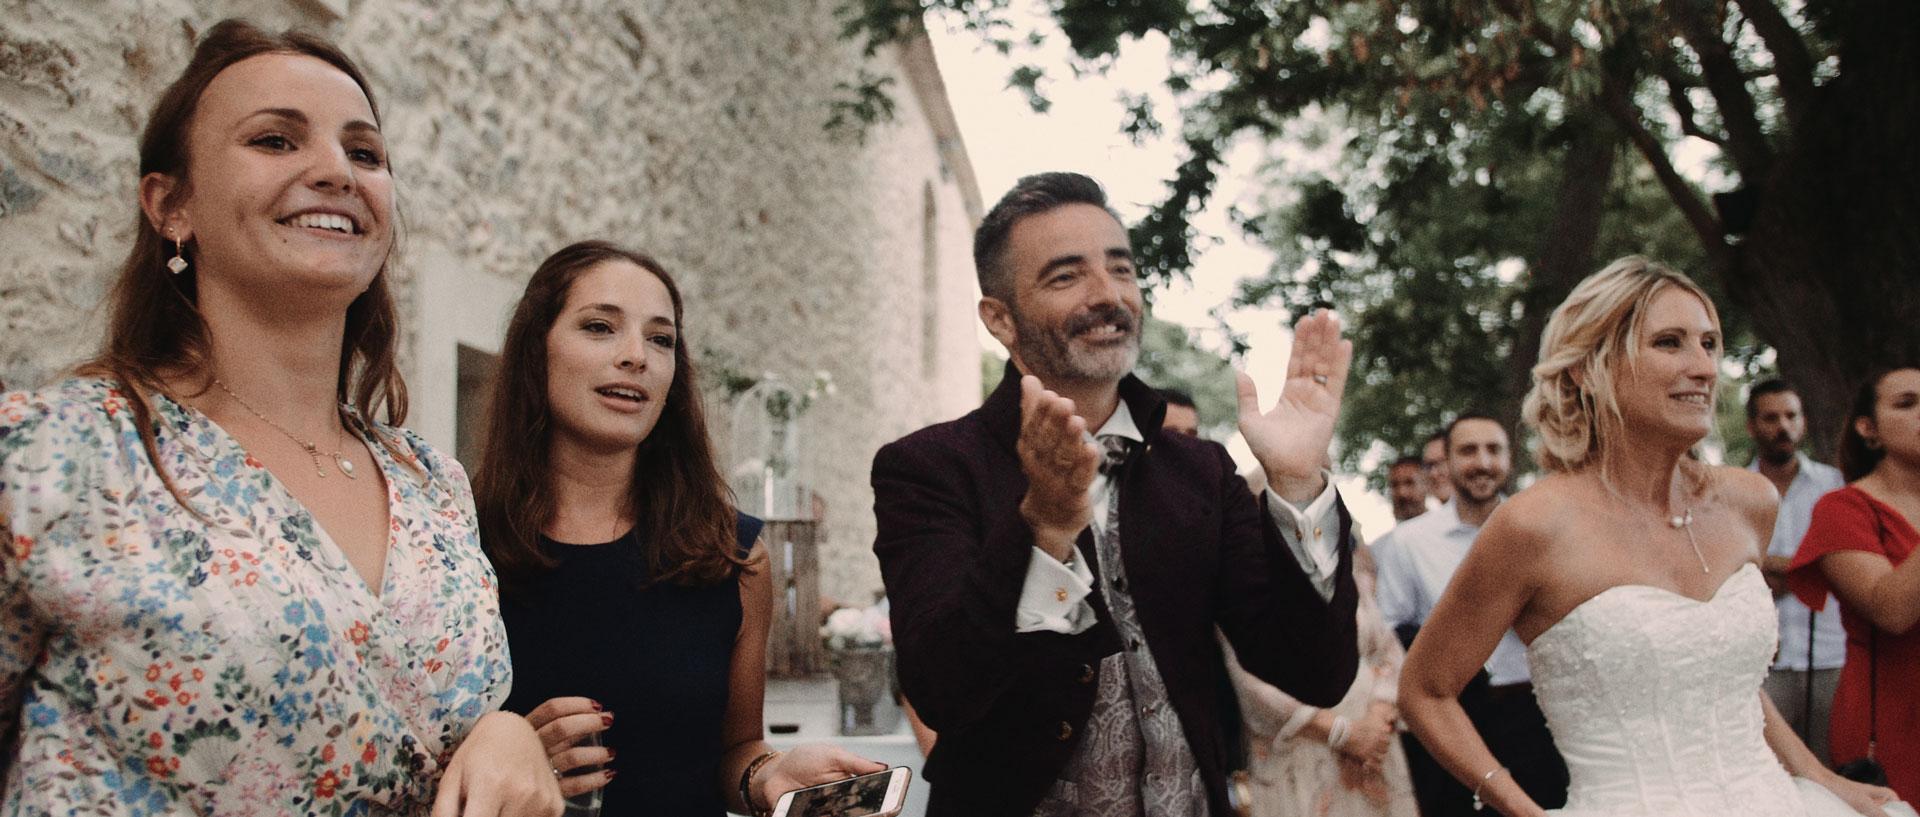 Delphine & Romulad Domaine Moures Bord de Mer Film Mariage (18).jpg